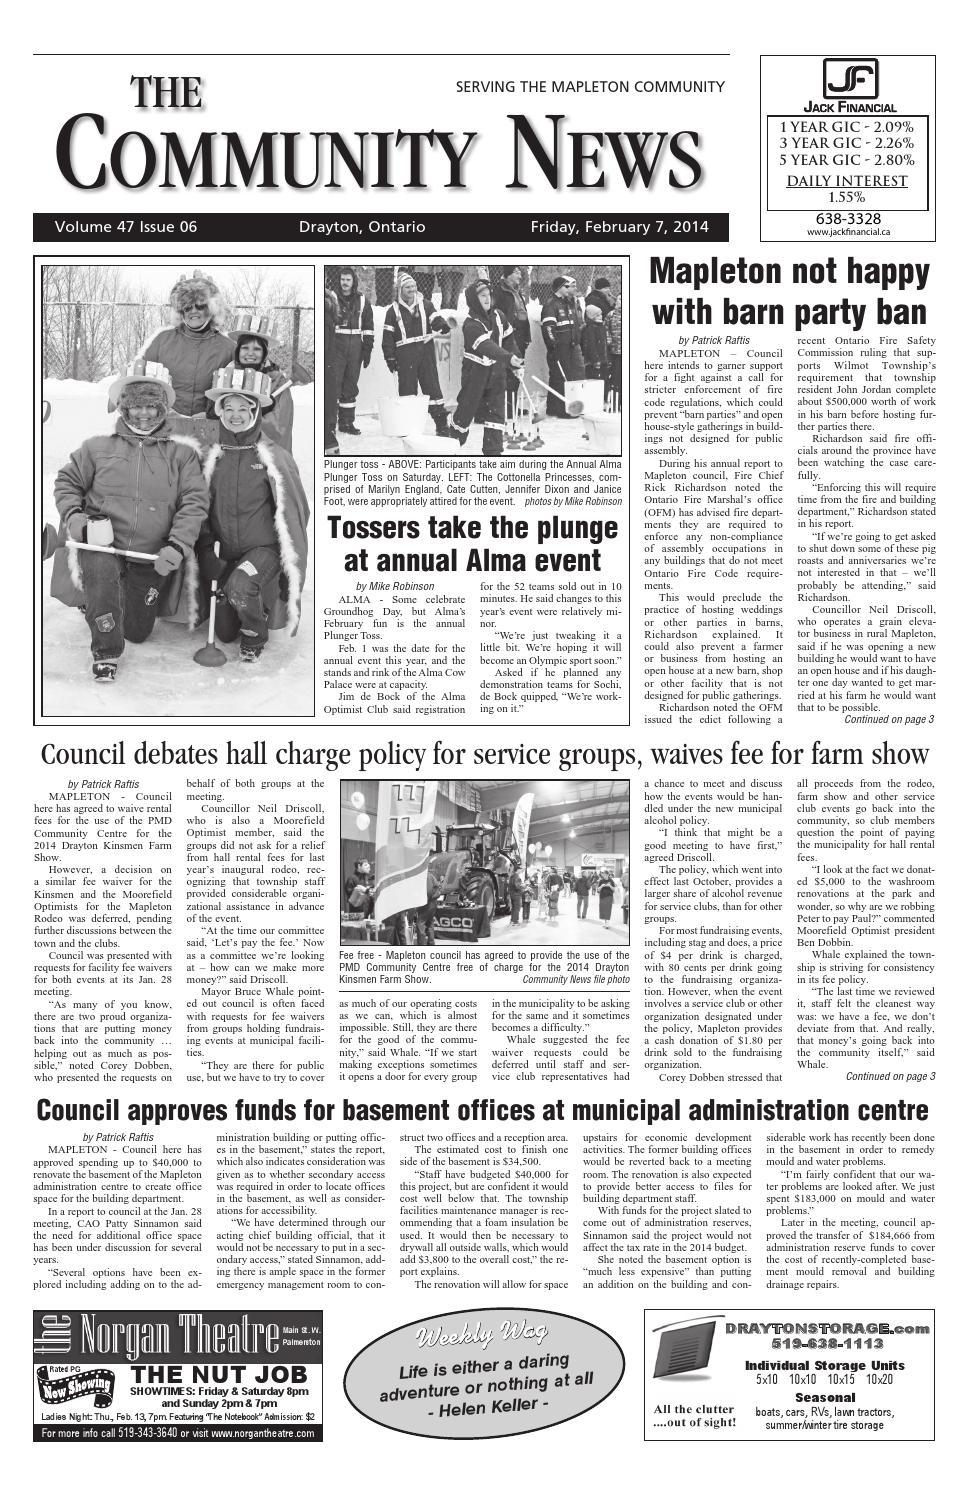 Drayton Community News February 7, 2014 by WHA Publications Ltd. - issuu